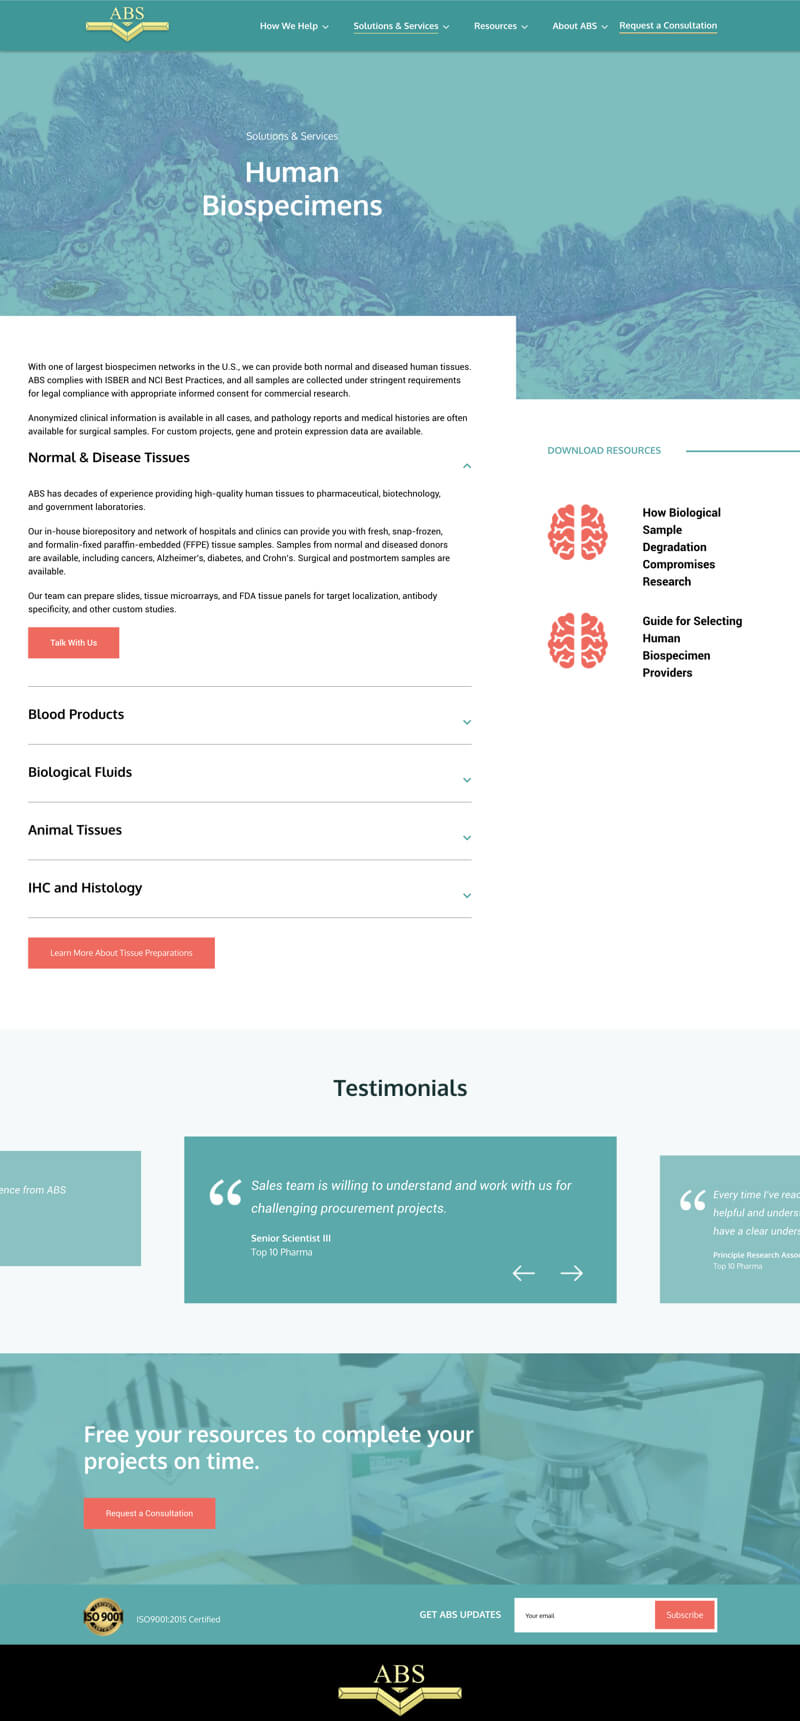 ABS website design